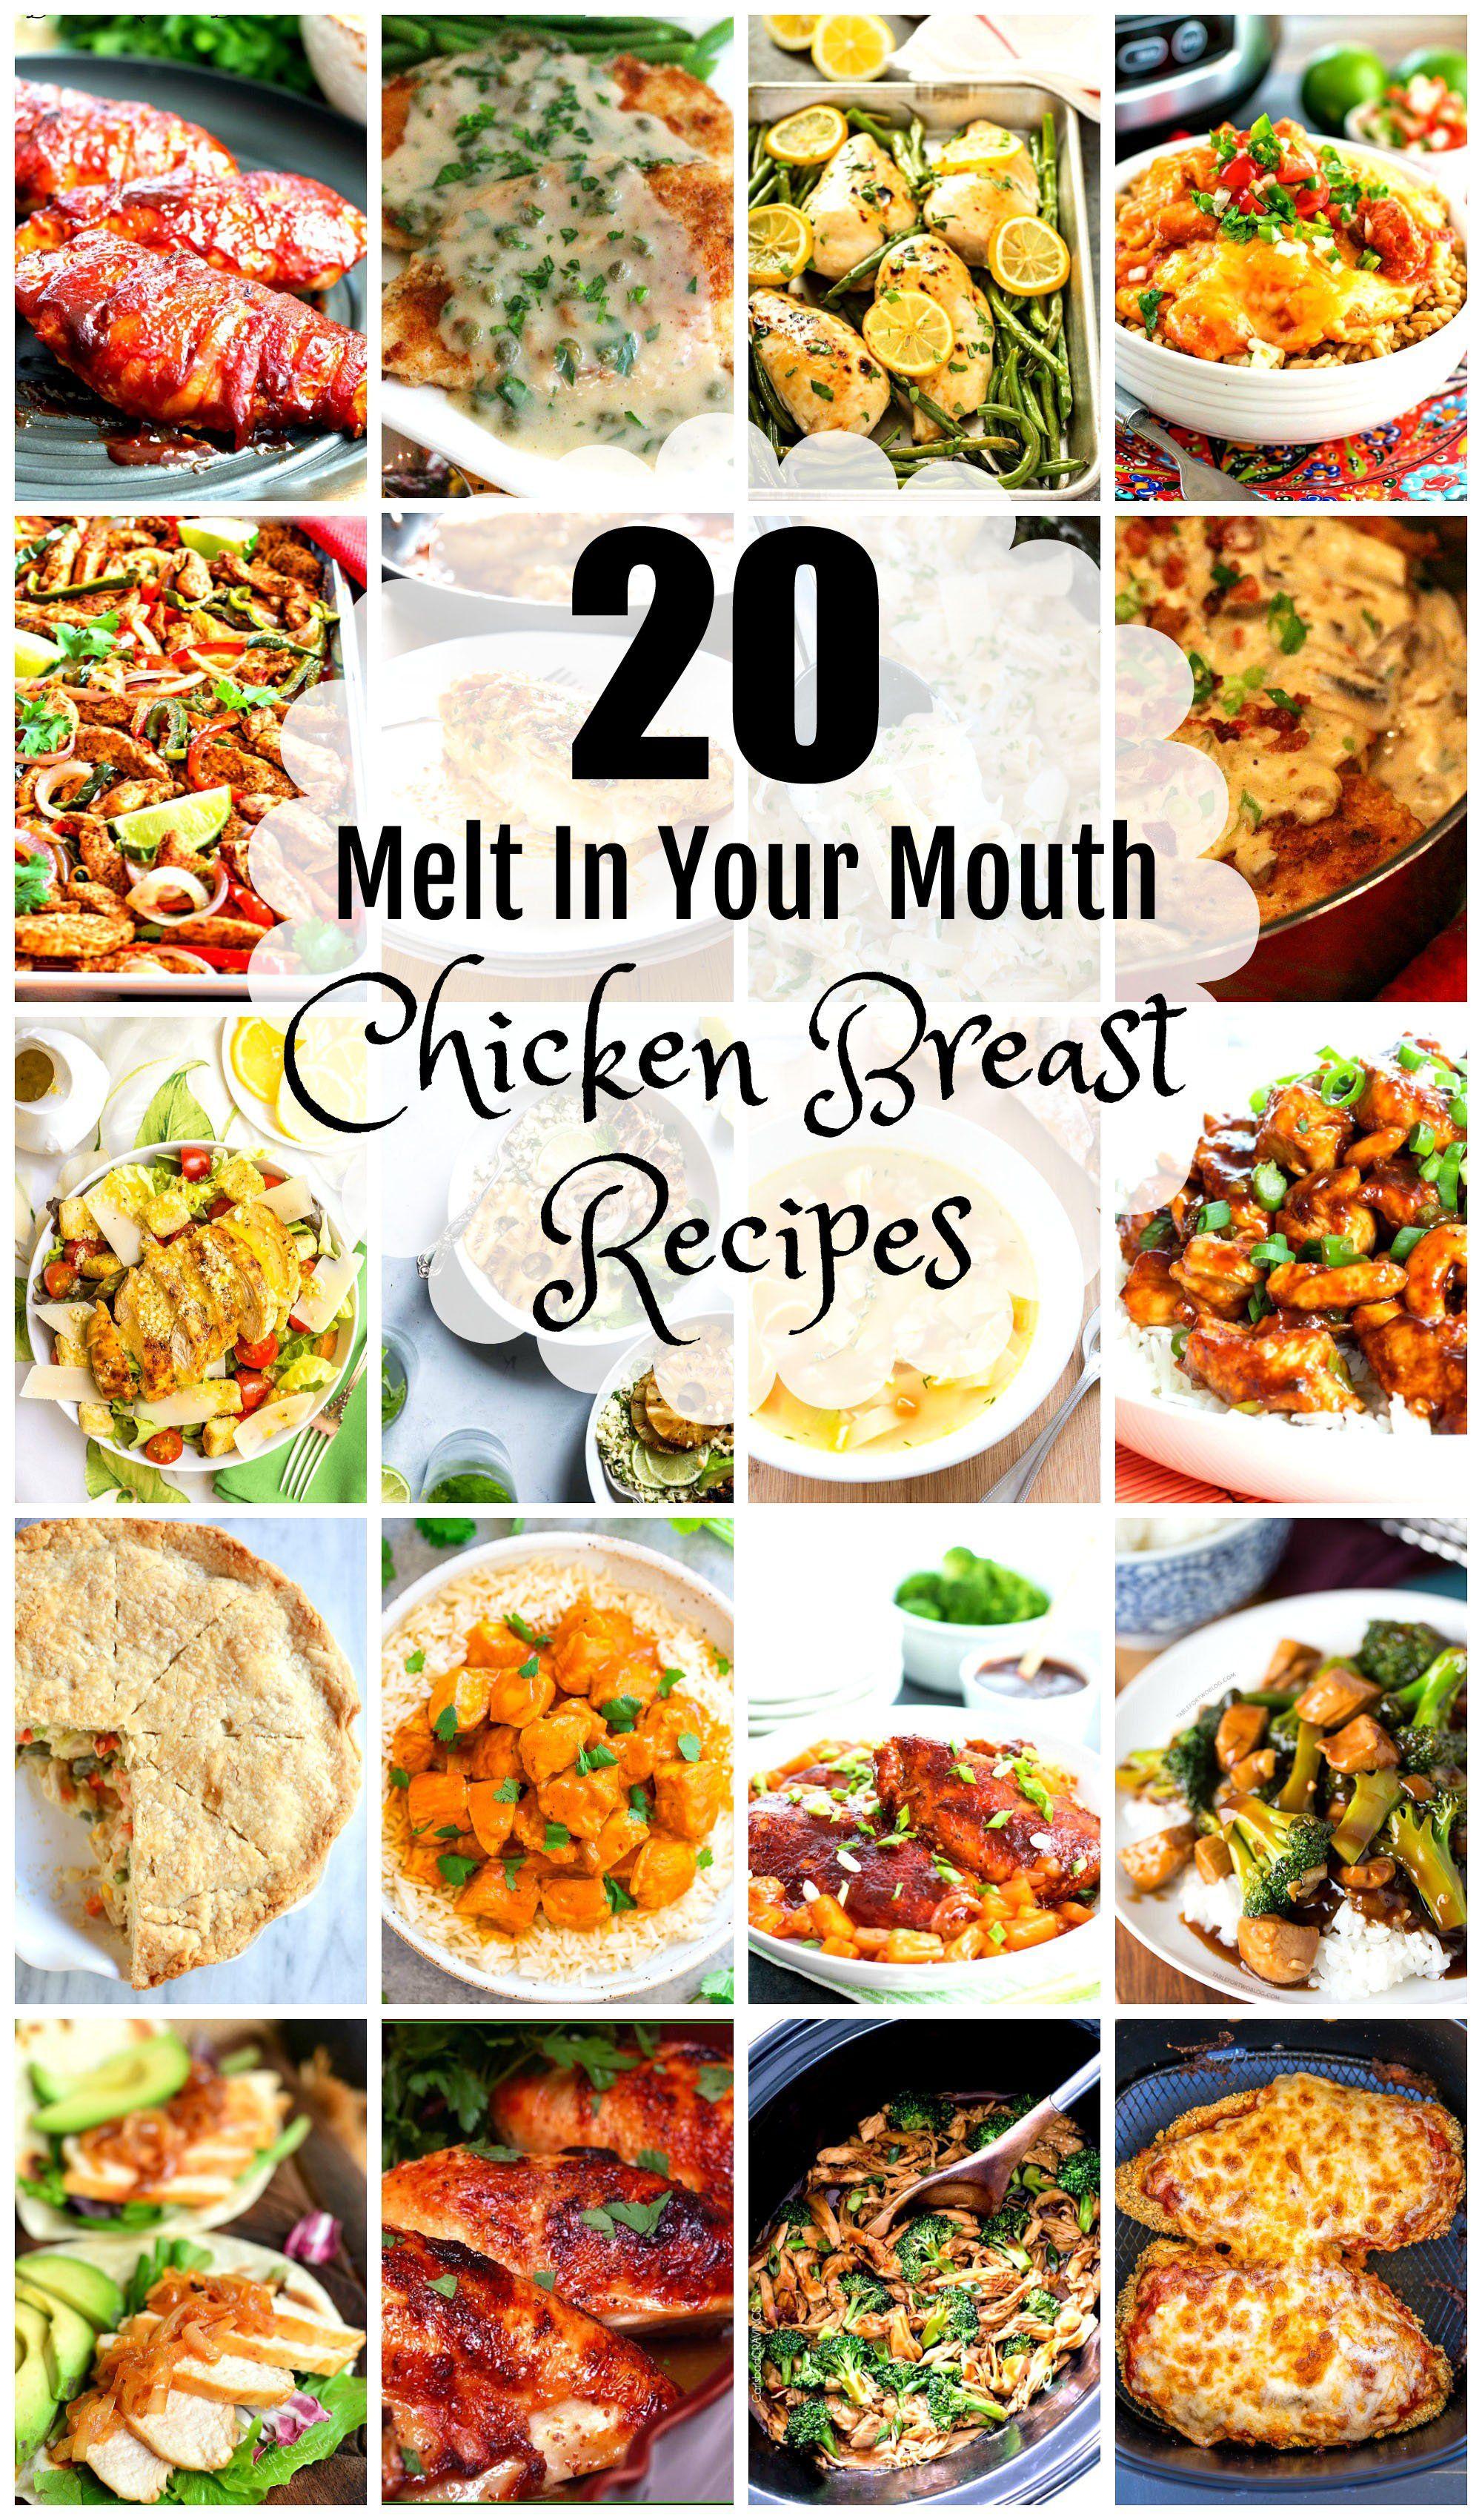 20 Melt-In-Your-Mouth Chicken Breast Recipes | MSSK Allstar